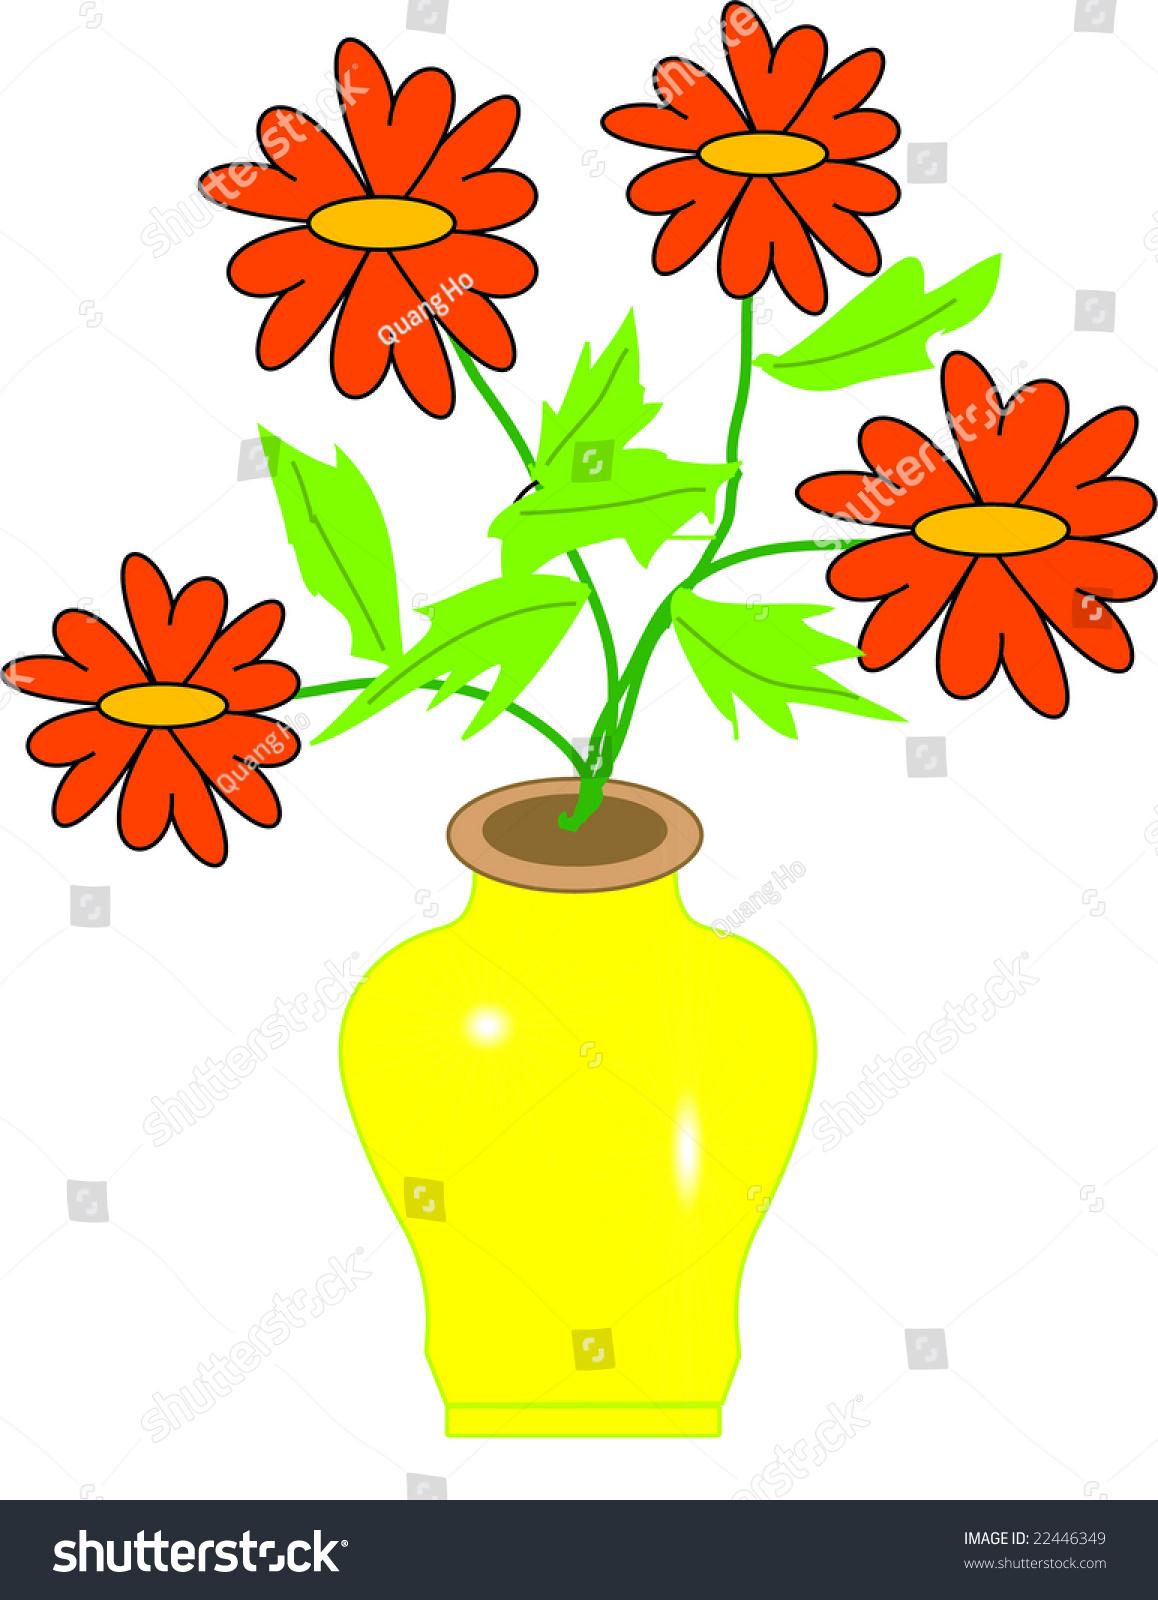 Apply on drawing flower vase stock illustration 22446349 apply on drawing flower vase reviewsmspy